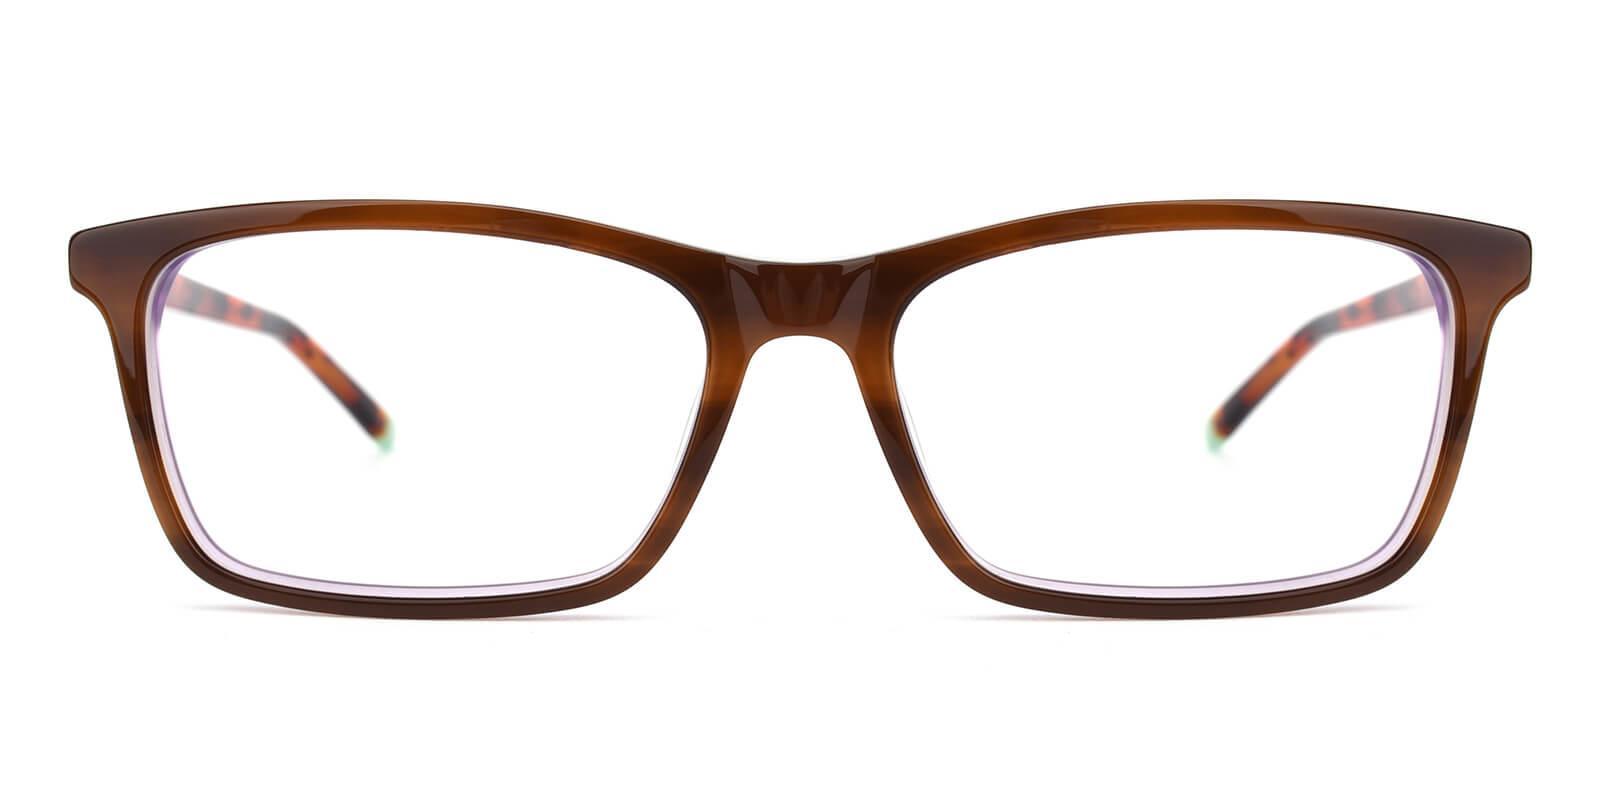 Crane-Tortoise-Acetate-Eyeglasses-detail